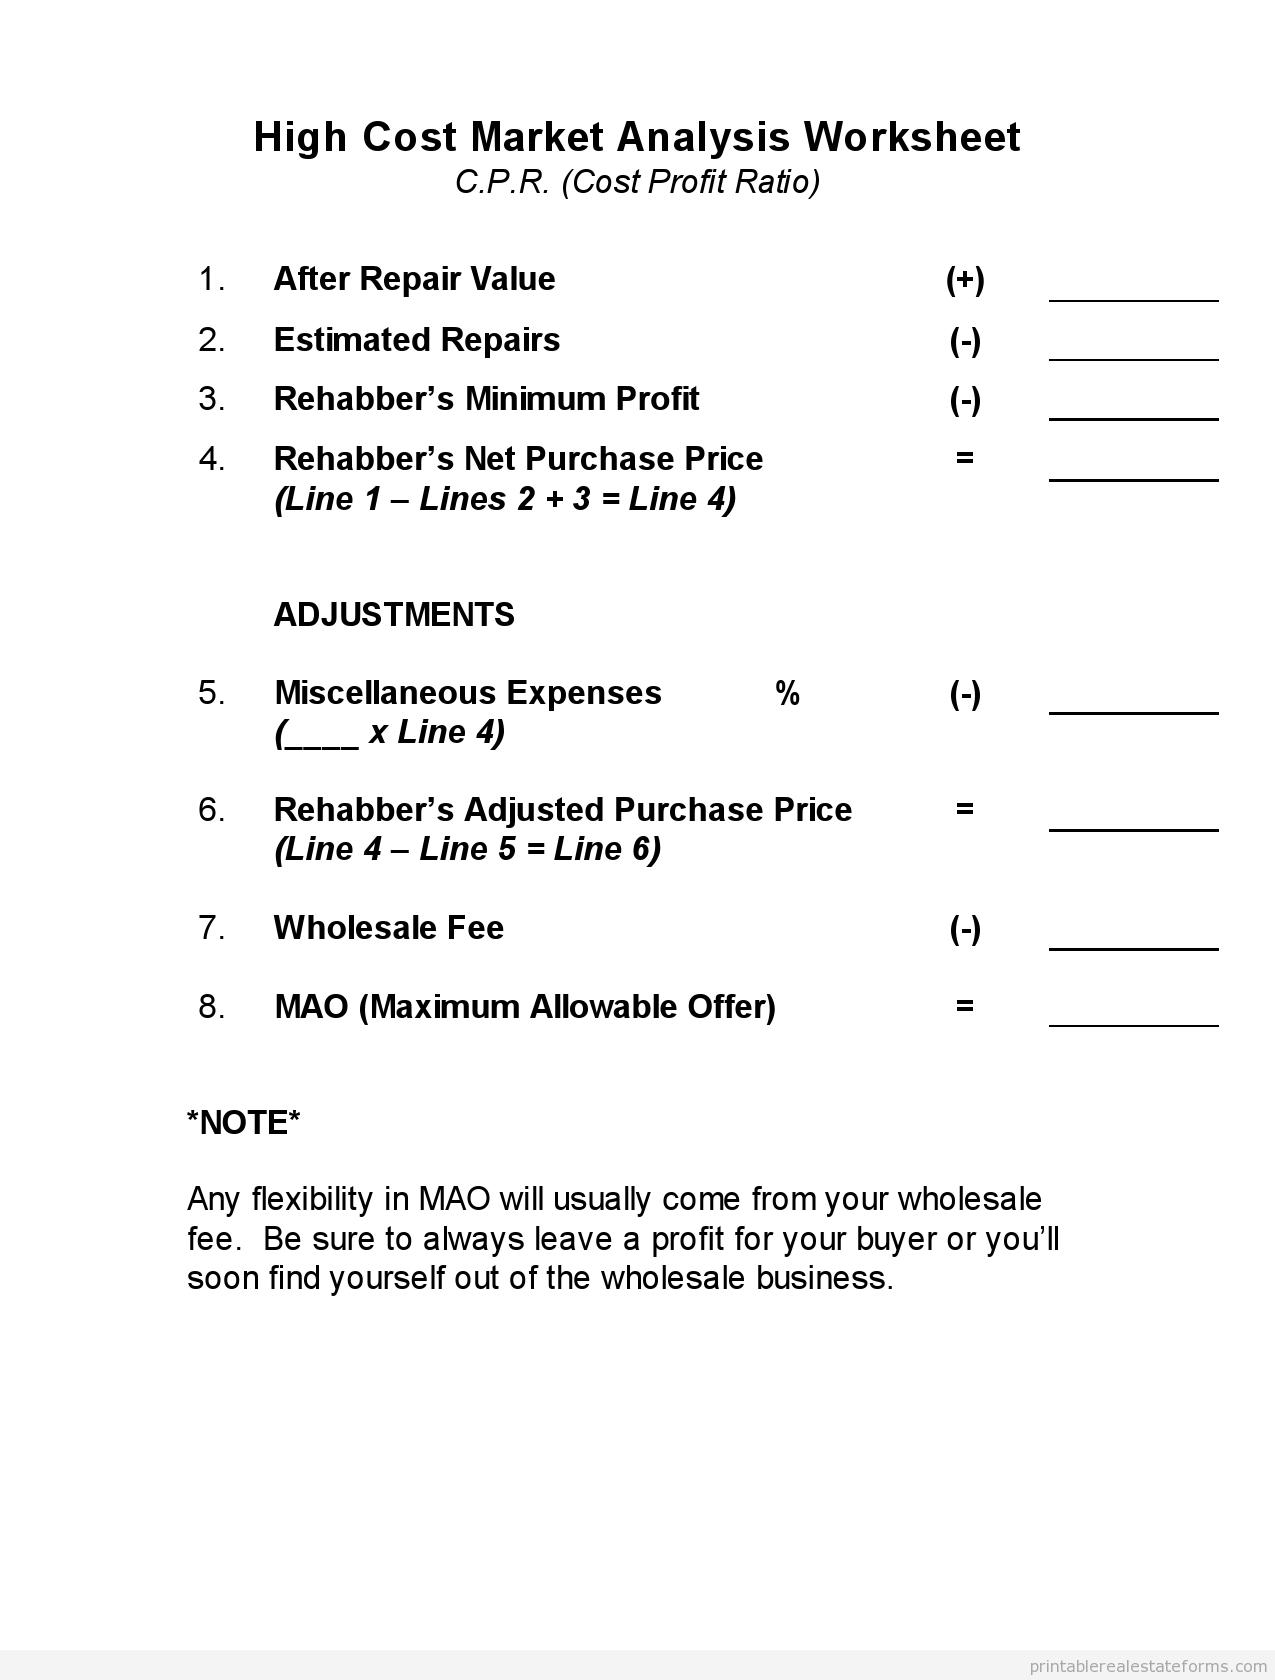 Printable High Cost Marketysis Worksheet Template